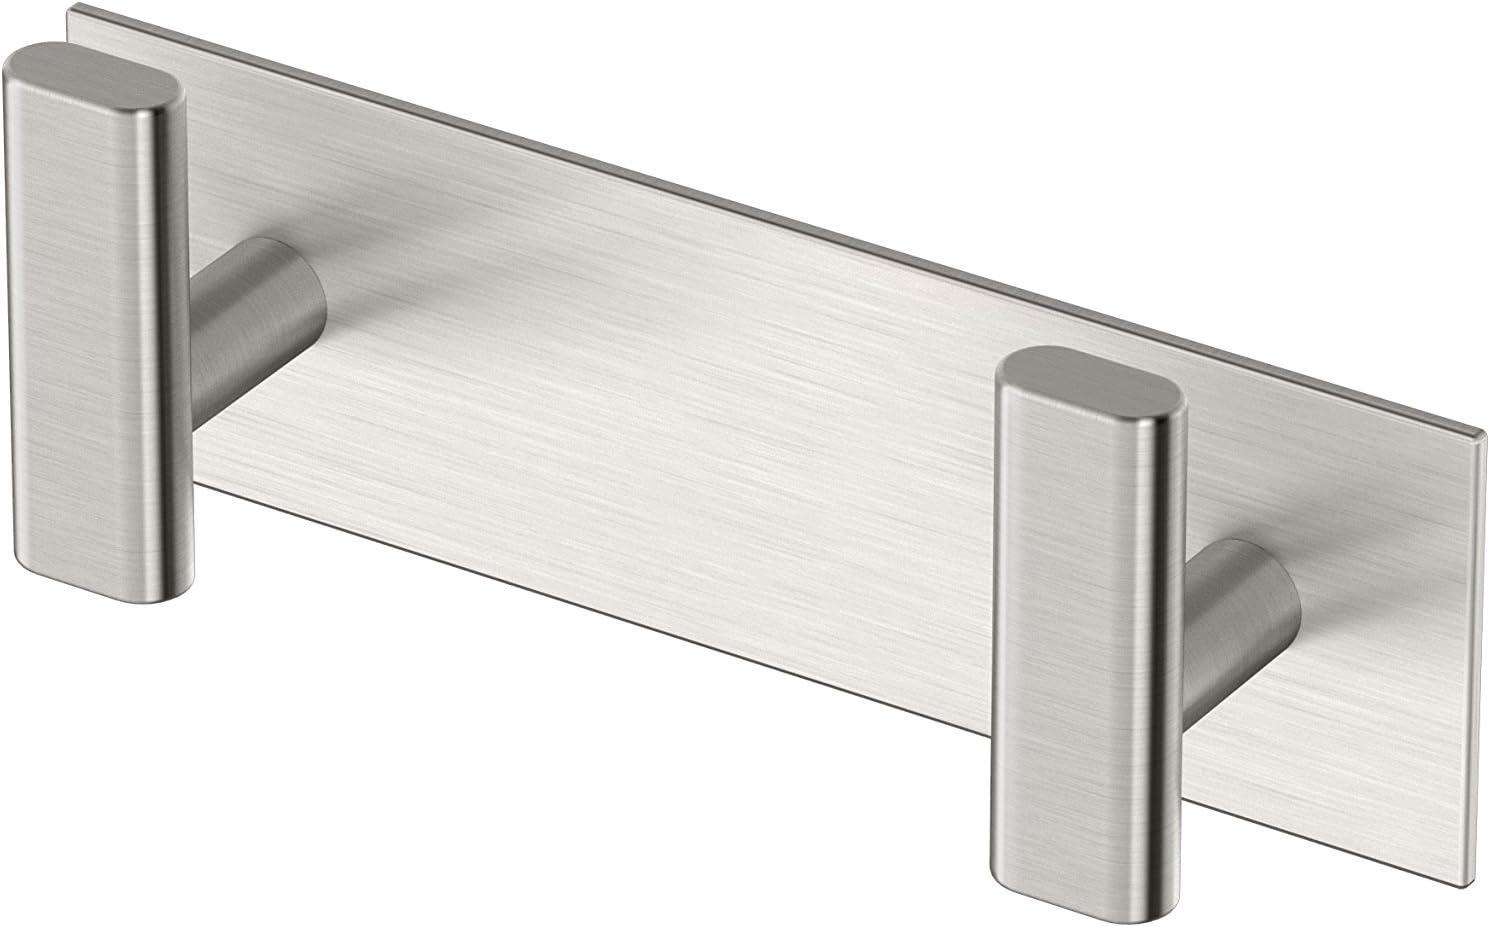 Gatco 1283SN Elevate All Modern Décor Hook, Double, Satin Nickel